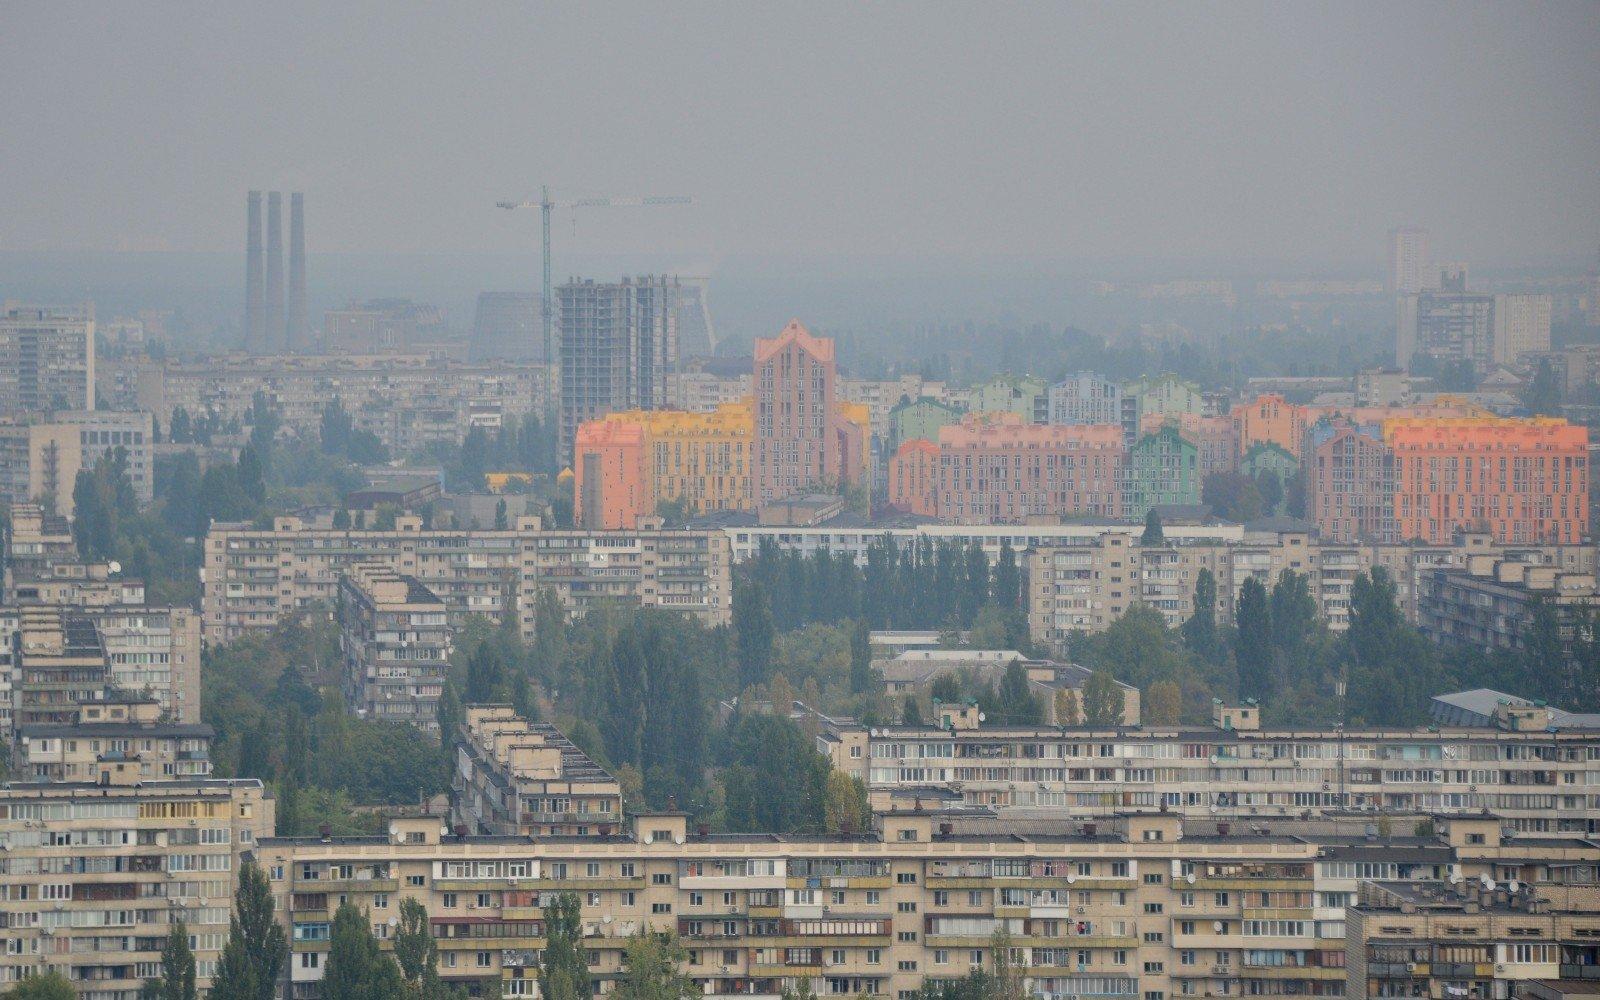 ВКиеве установят монумент правителю, разбившему впрах войска Московии